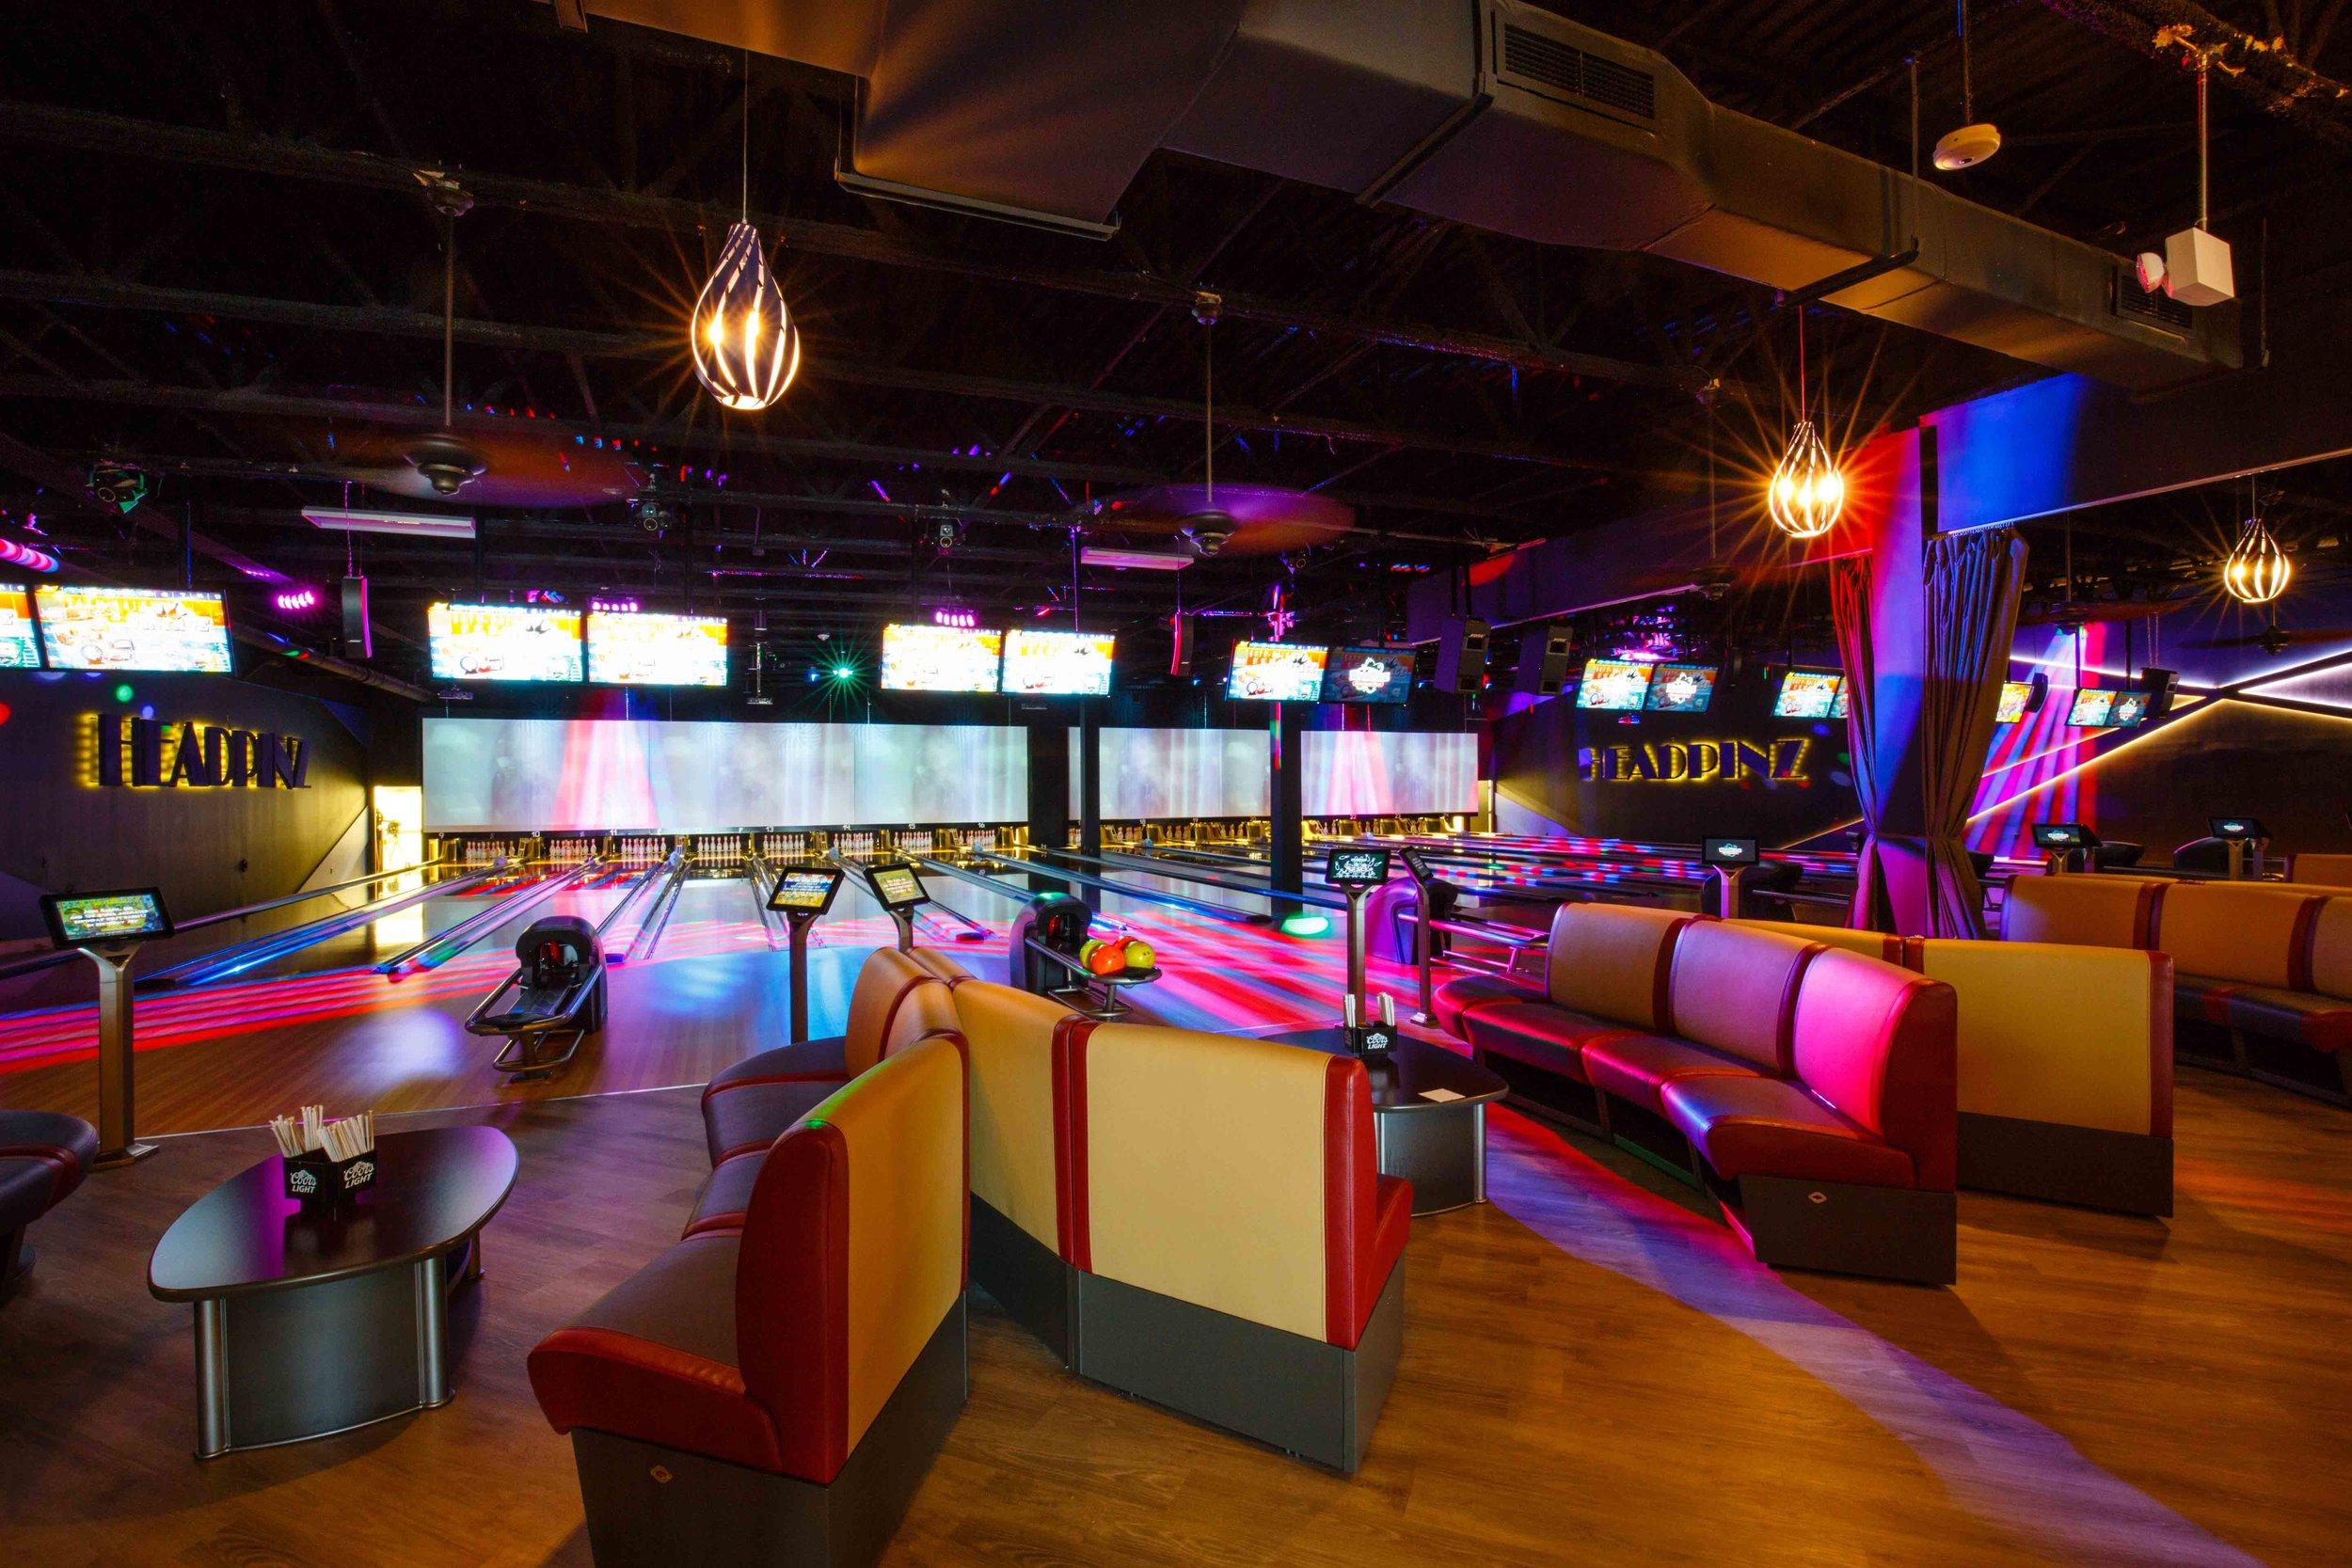 HeadPinz Entertainment - Fort Myers, Florida